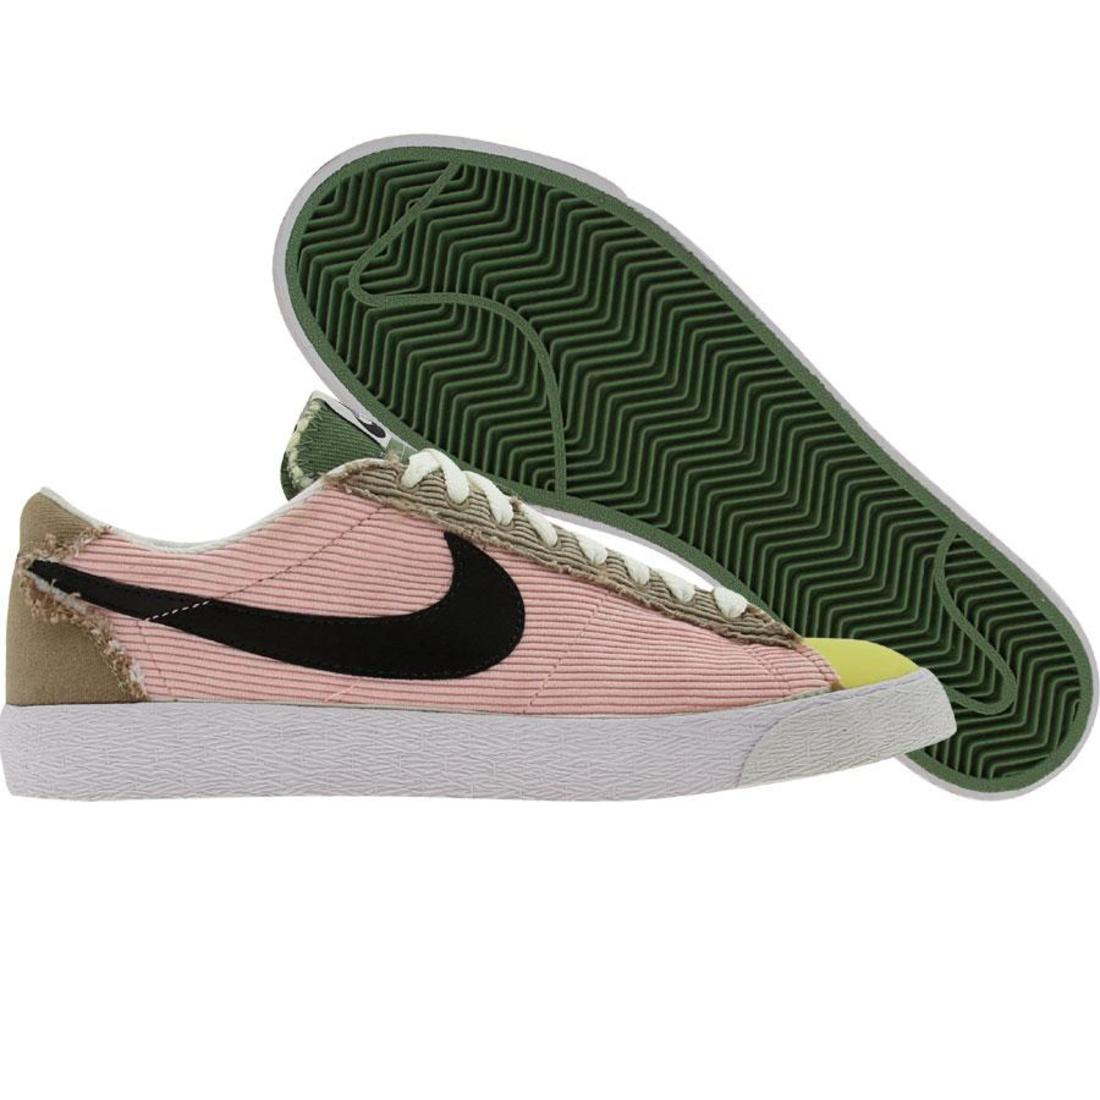 hot sale online e3327 aaa5b ... 317581-601 Nike femmes Blazer Low Classic Carnation Carnation Carnation  Noir Khaki 4dcff9 ...